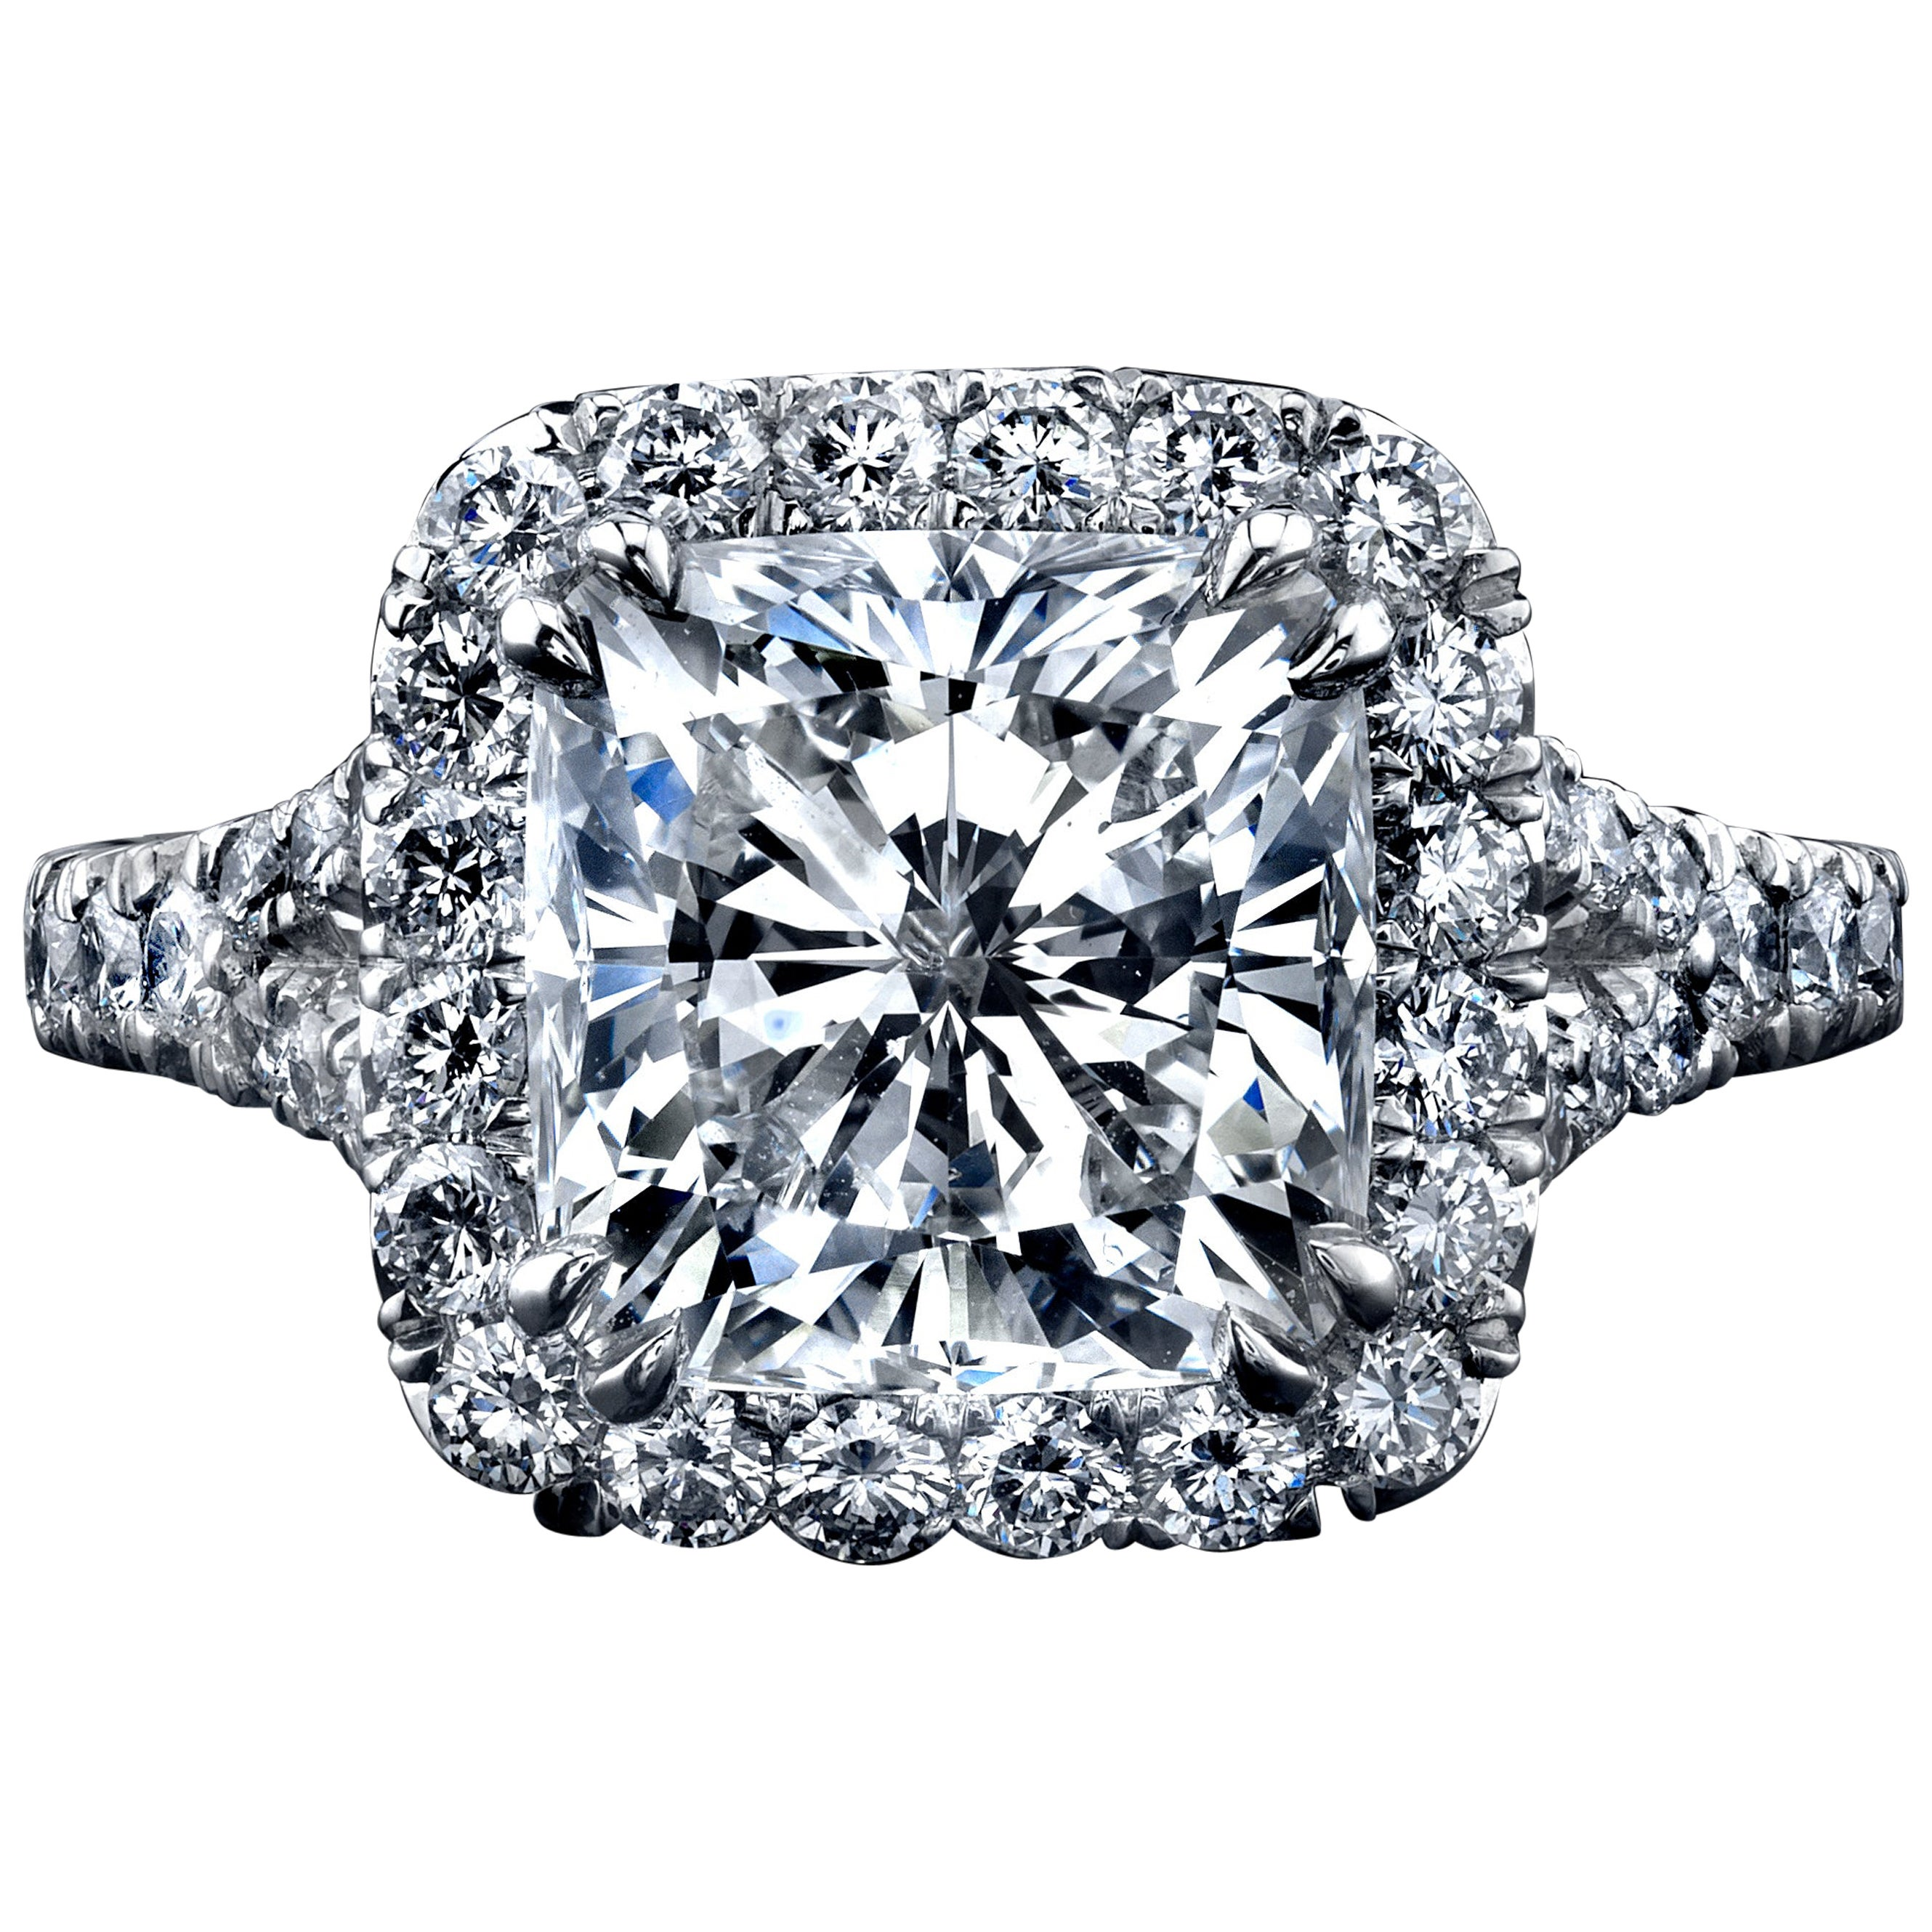 GIA Certified 4.05 Carat Cushion Cut Diamond Ring with Halo